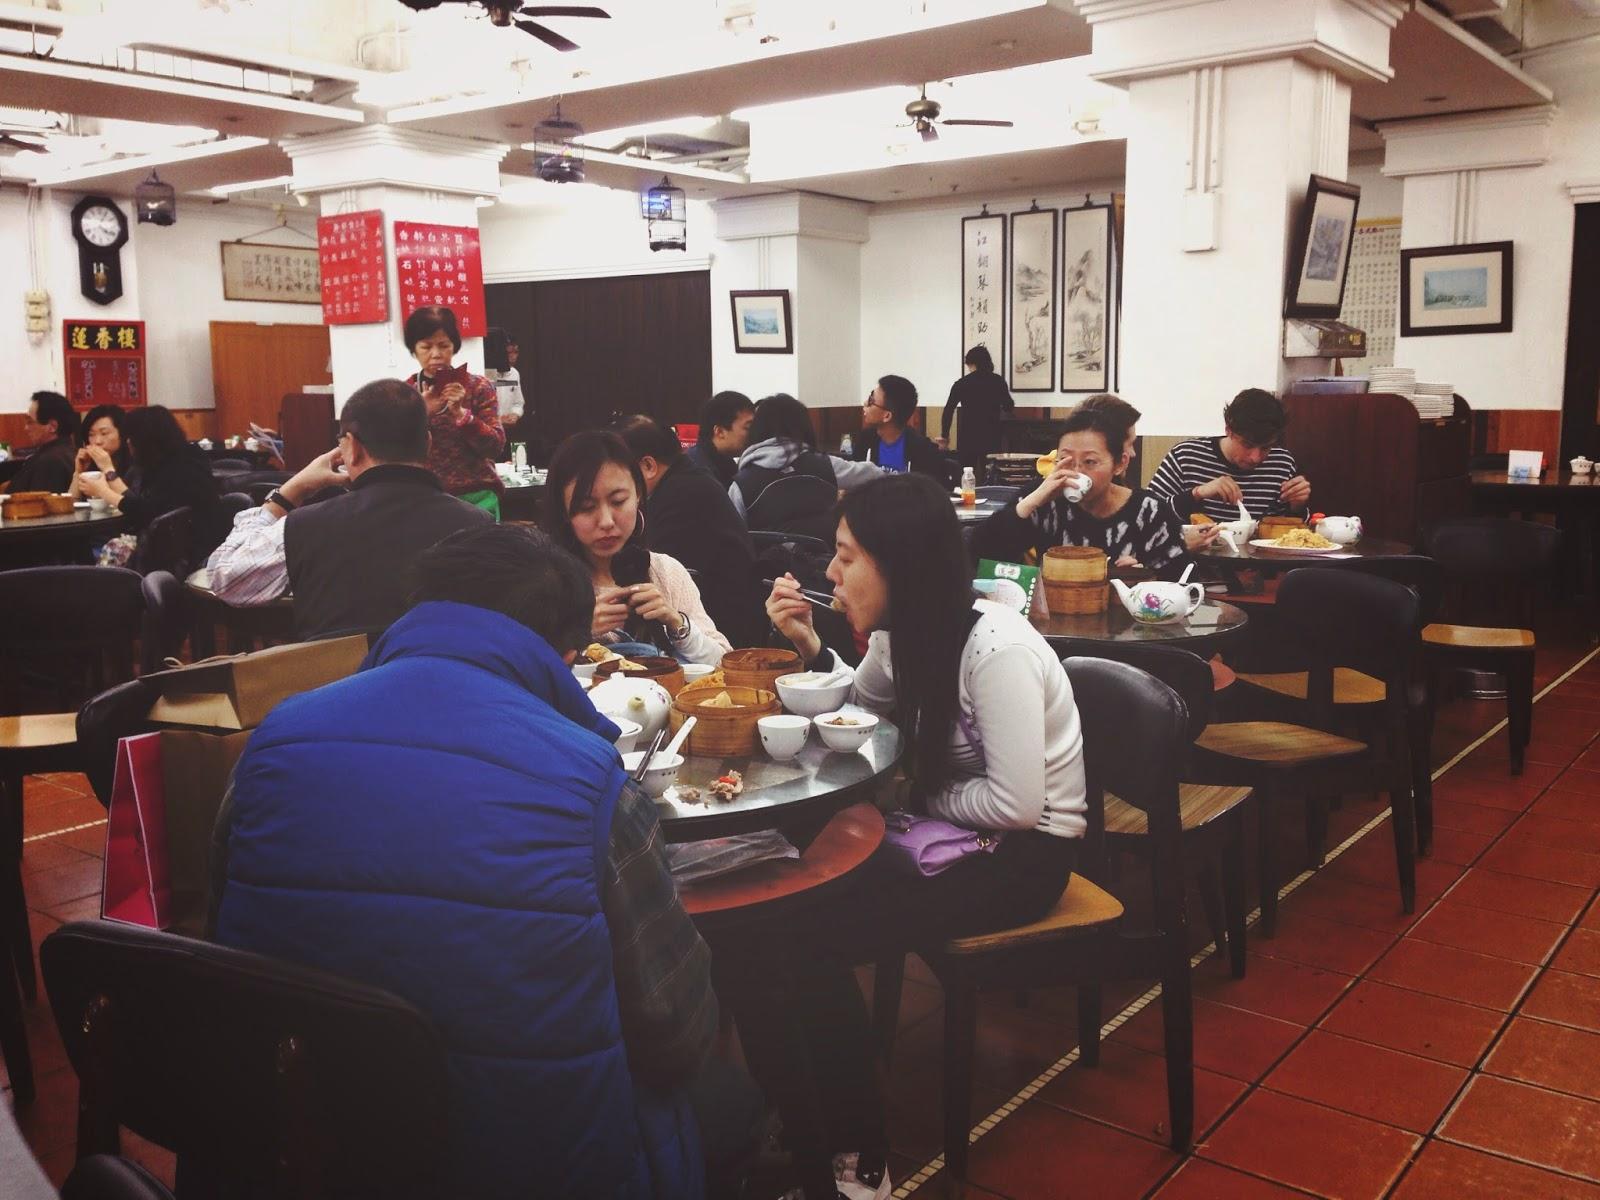 Lin Heung Tea House Hong Kong Restuarant